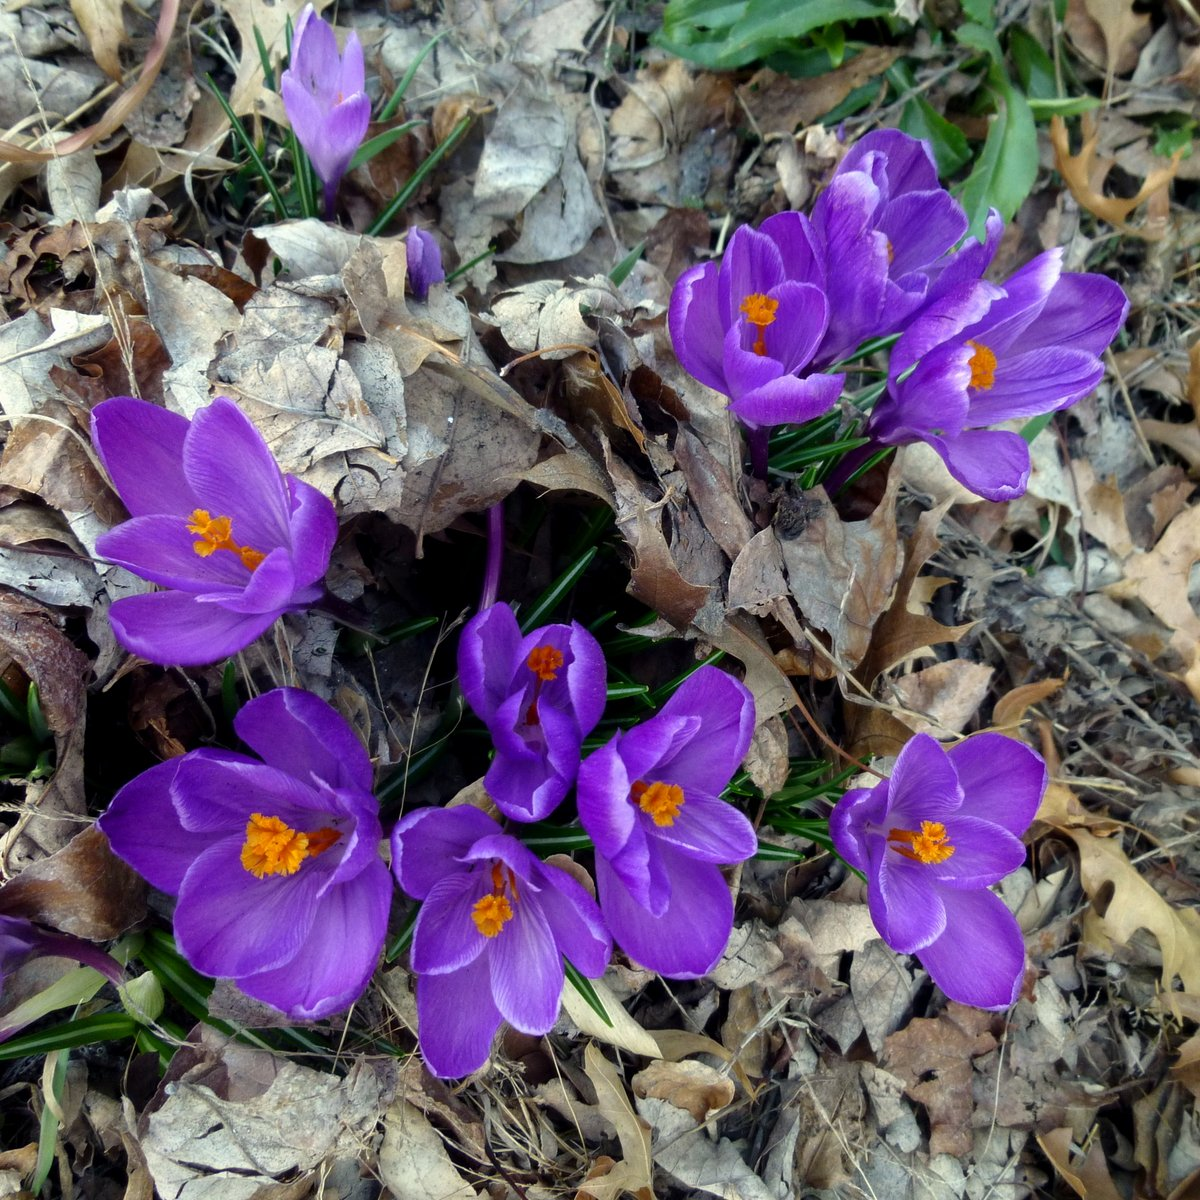 2. Deep Purple Crocus